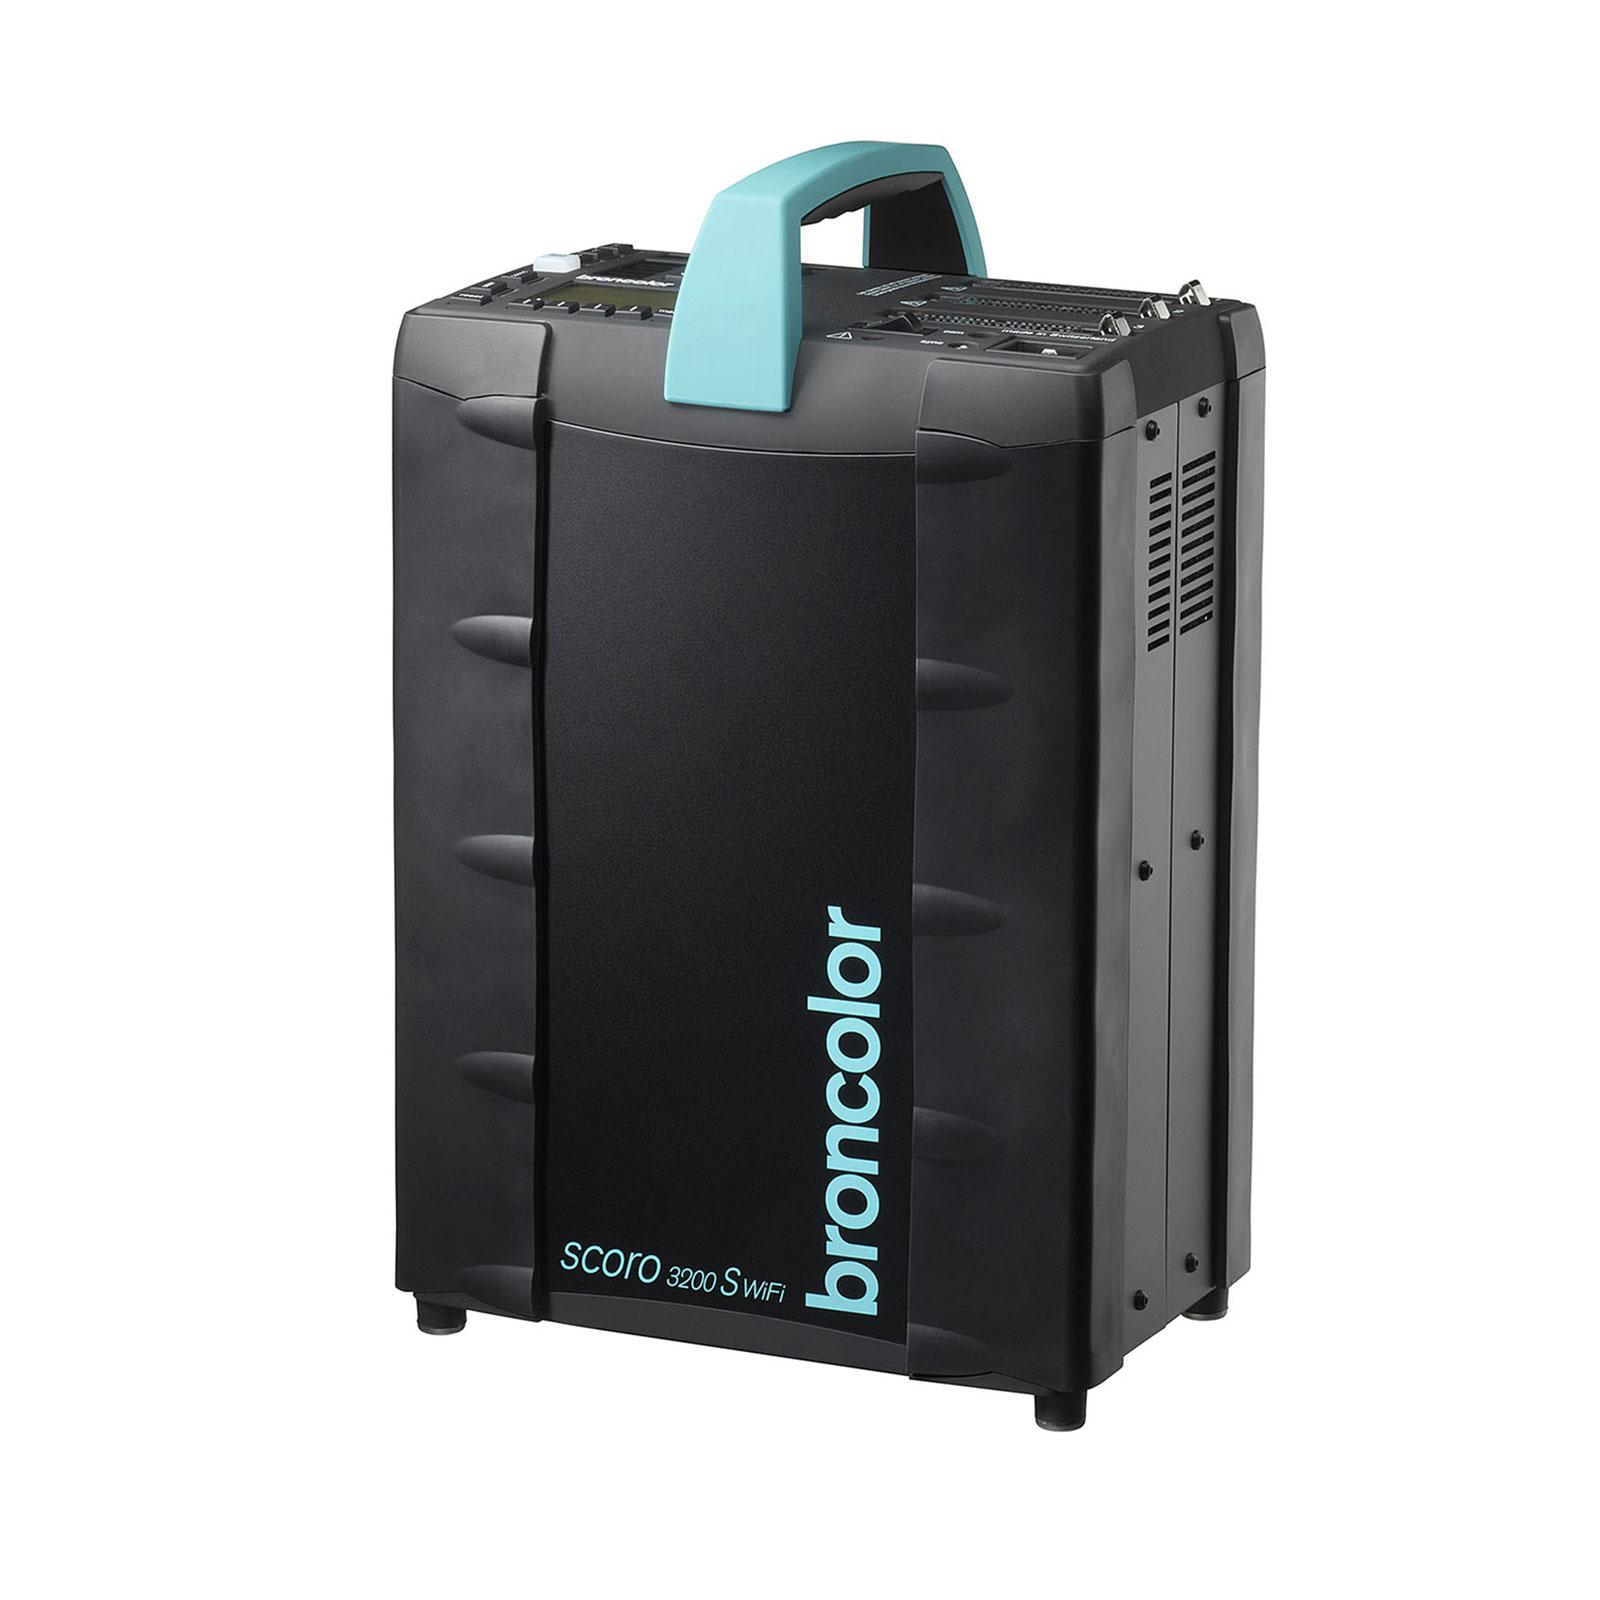 Noleggio Broncolor Scoro S 3200 wifi